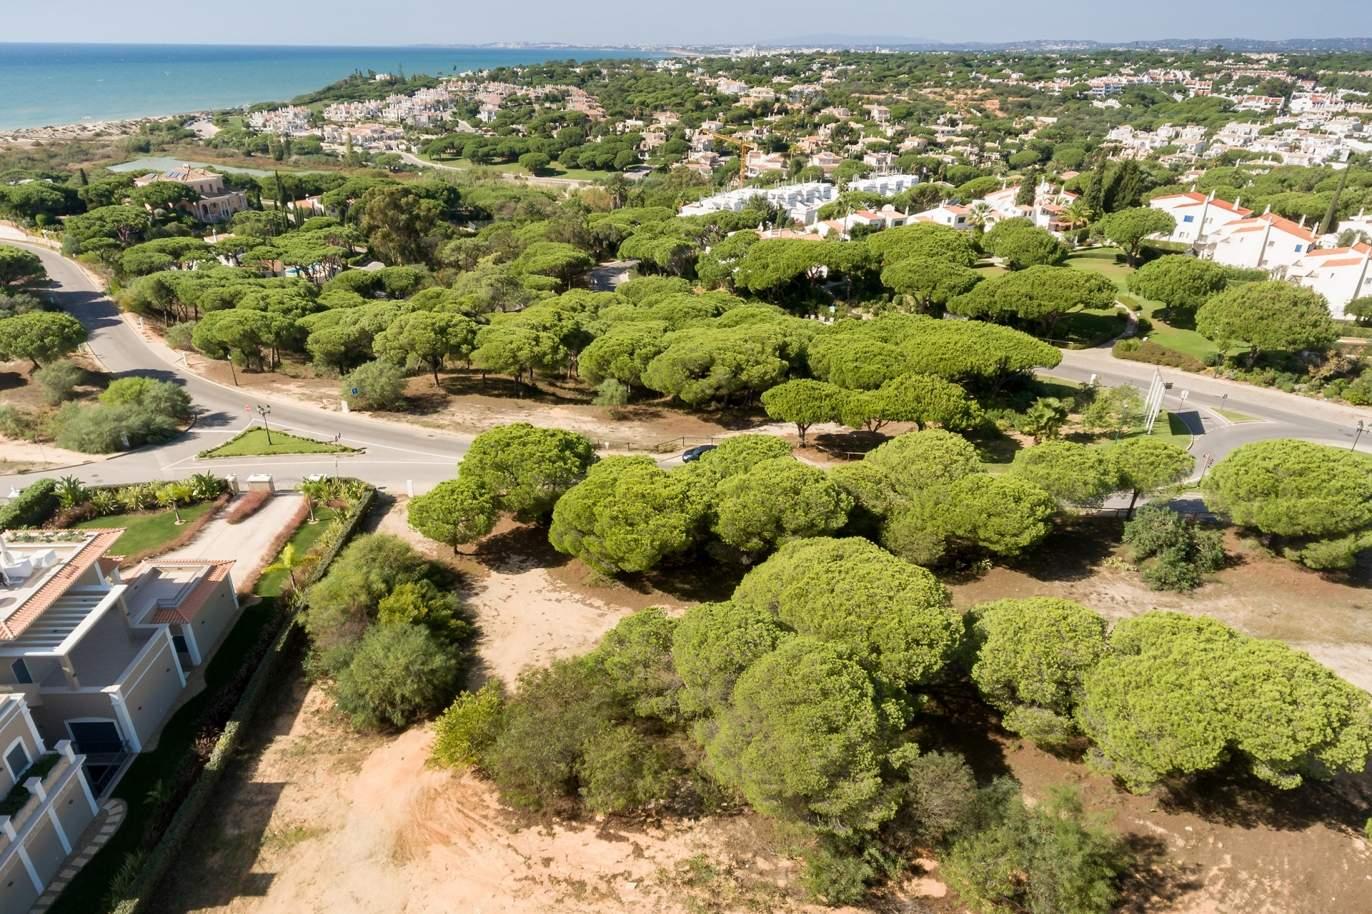 plot-of-land-next-to-the-ria-formosa-natural-park-vale-do-lobo-algarve